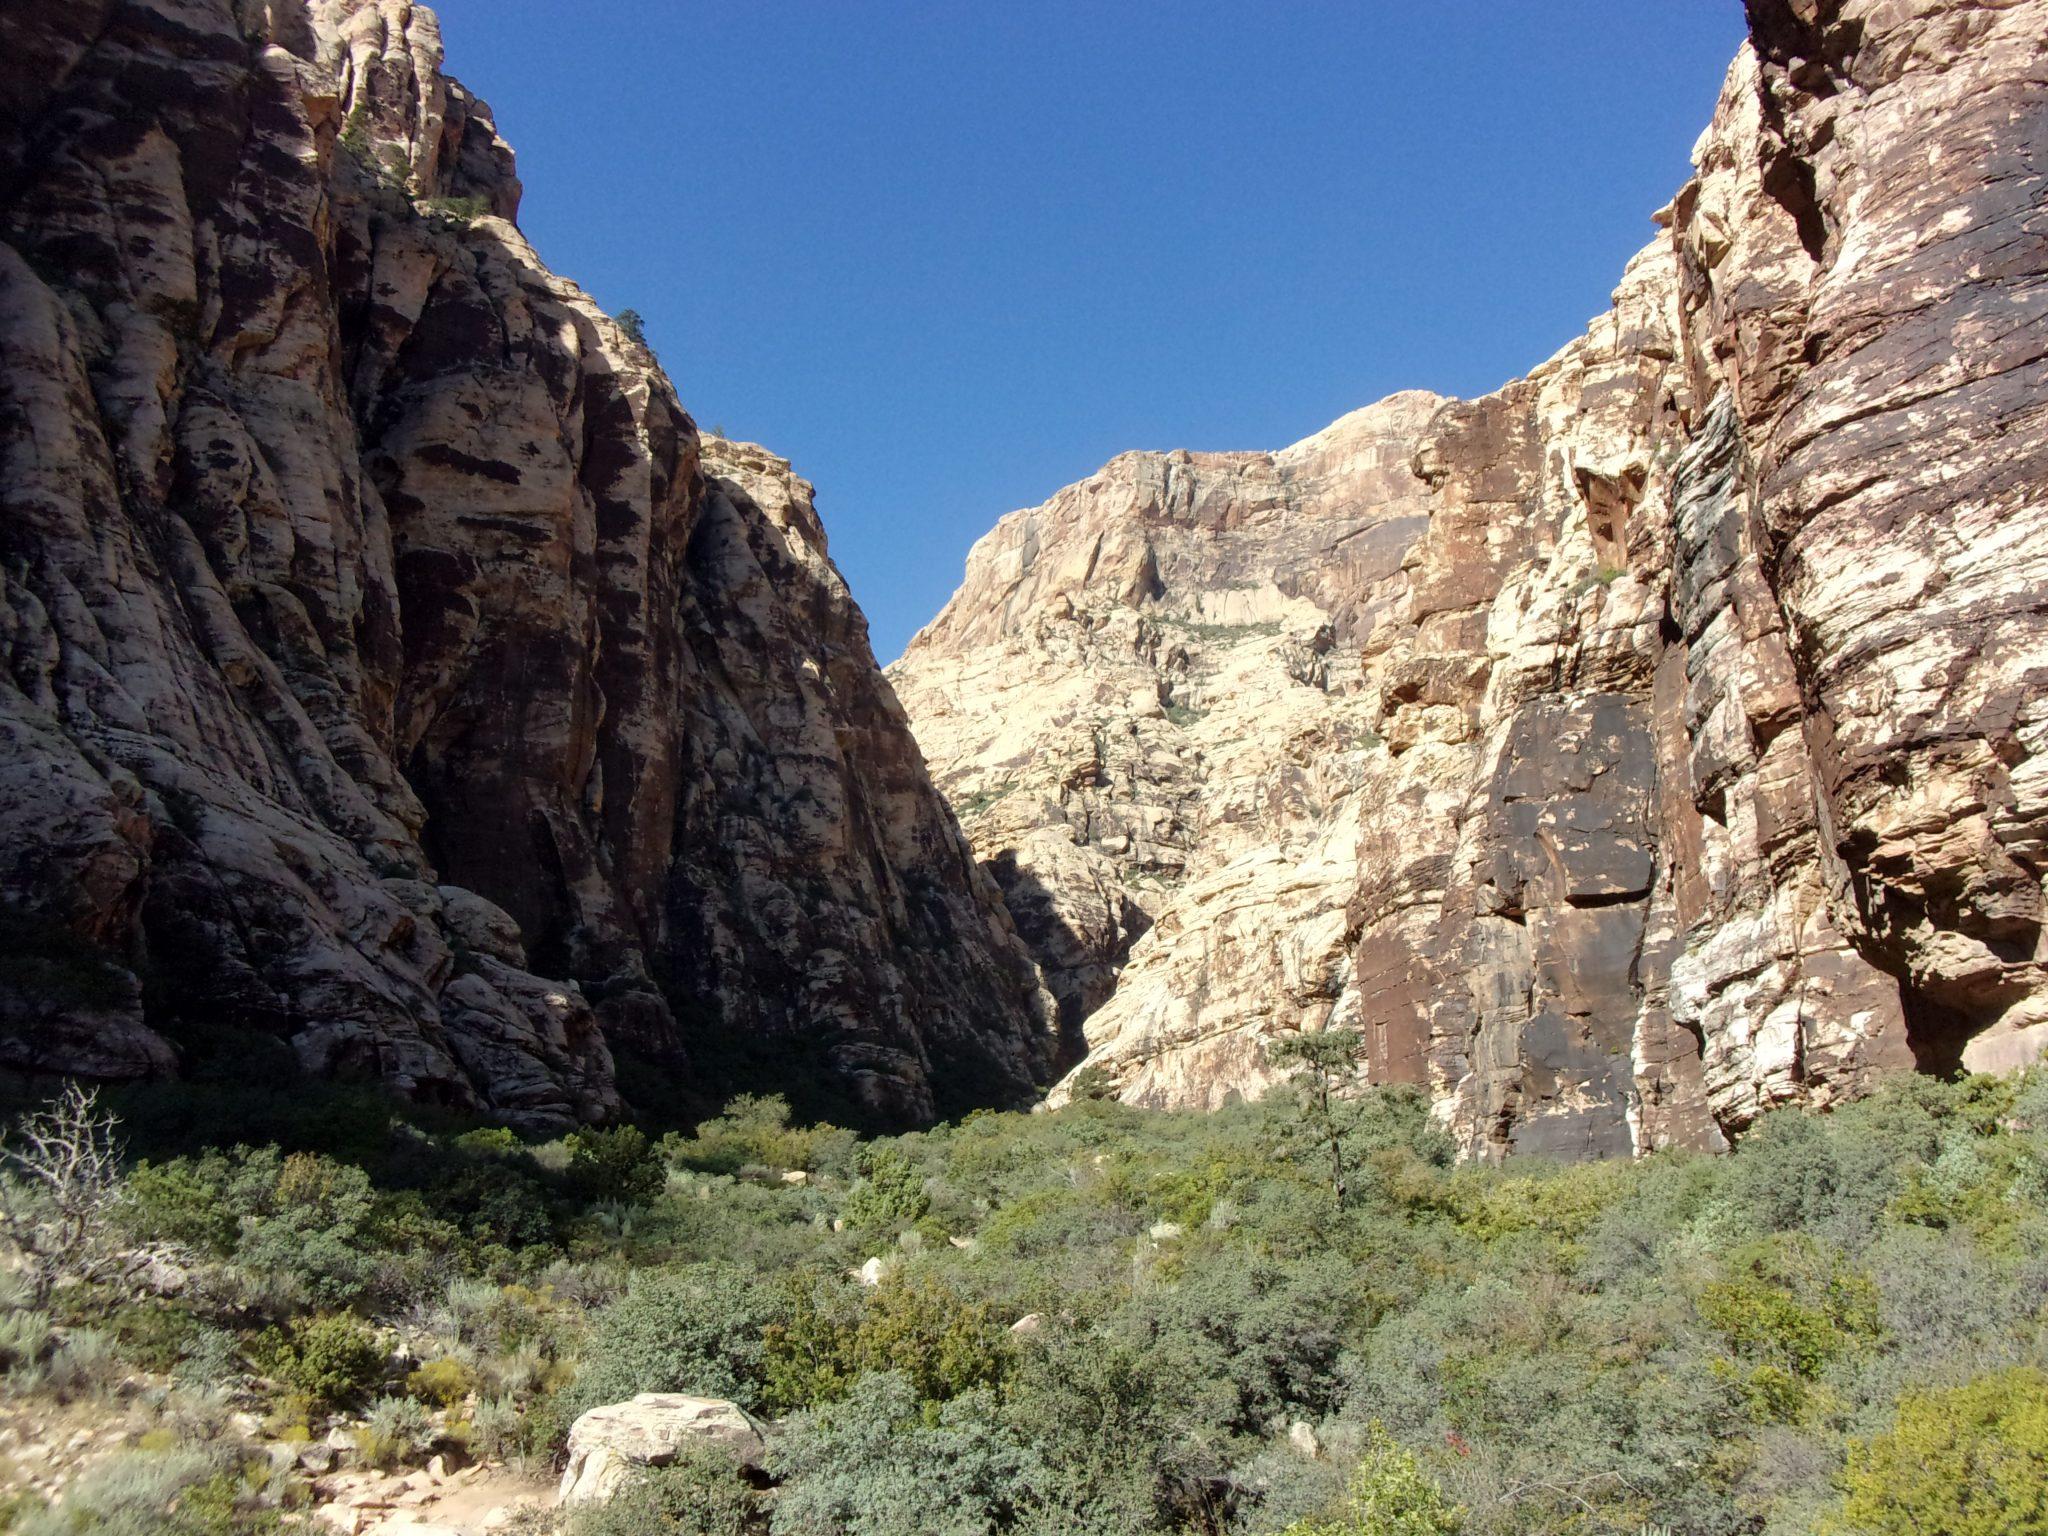 Icebox Canyon Trail: Chillin' Near Las Vegas